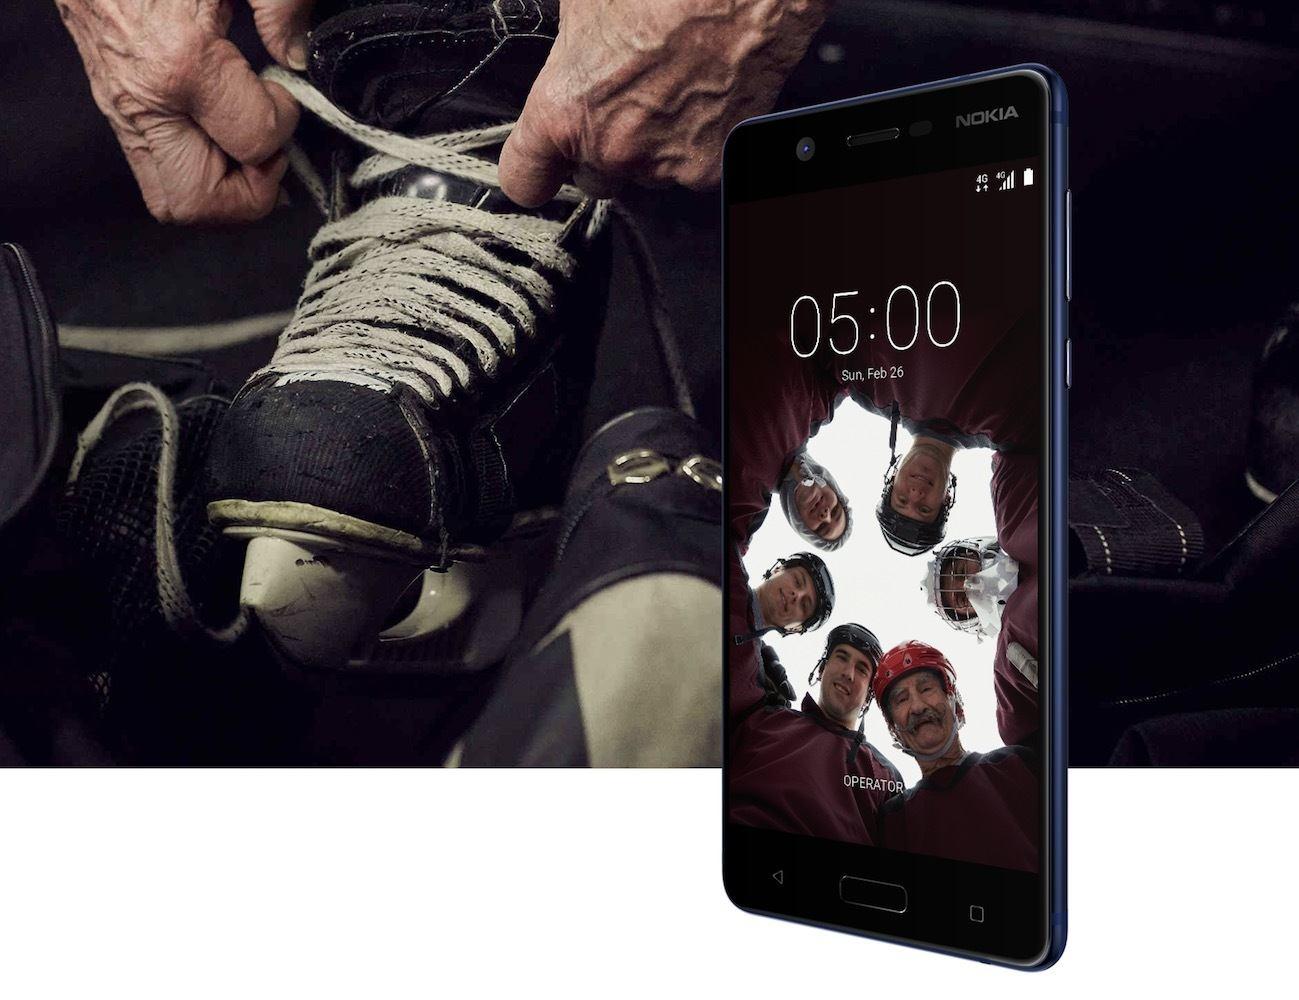 Nokia 5 Sleek Android Smartphone